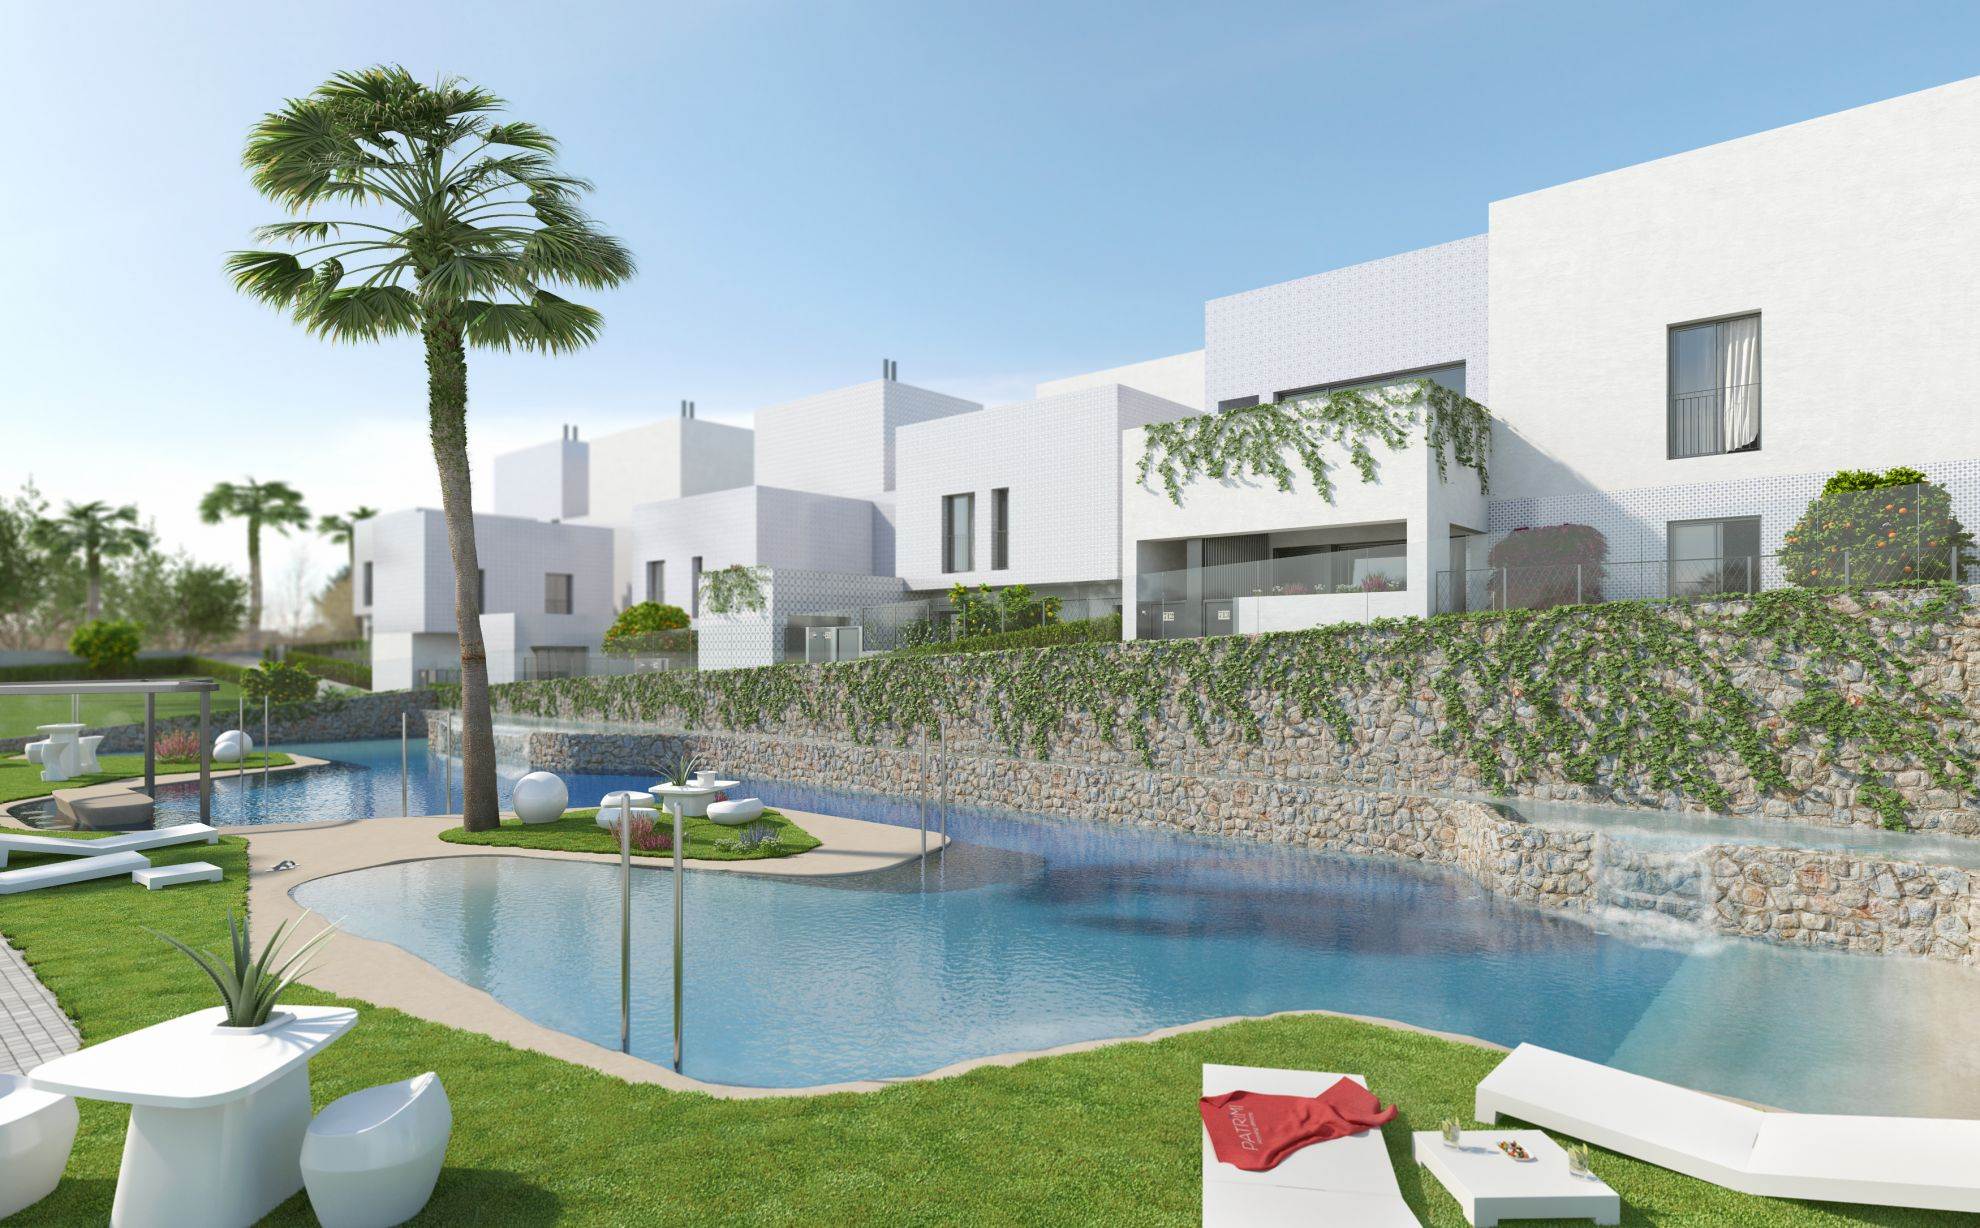 3 bedroom villa with private garden in complex with pool in Villamartín 1